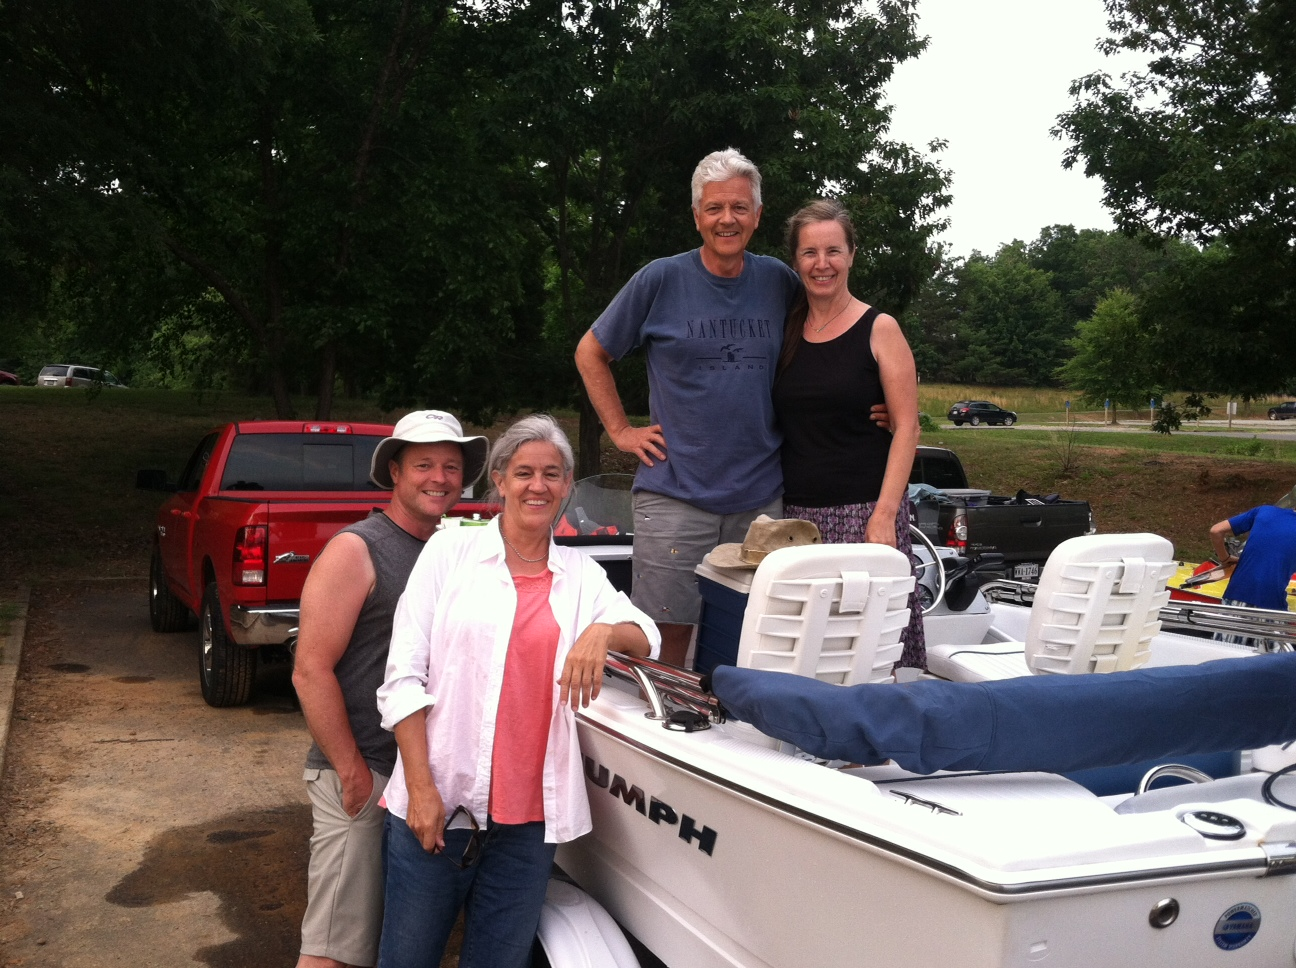 The Fishing Boat Crew: Steven & Amy Dunavant & Robert & Jill Cox